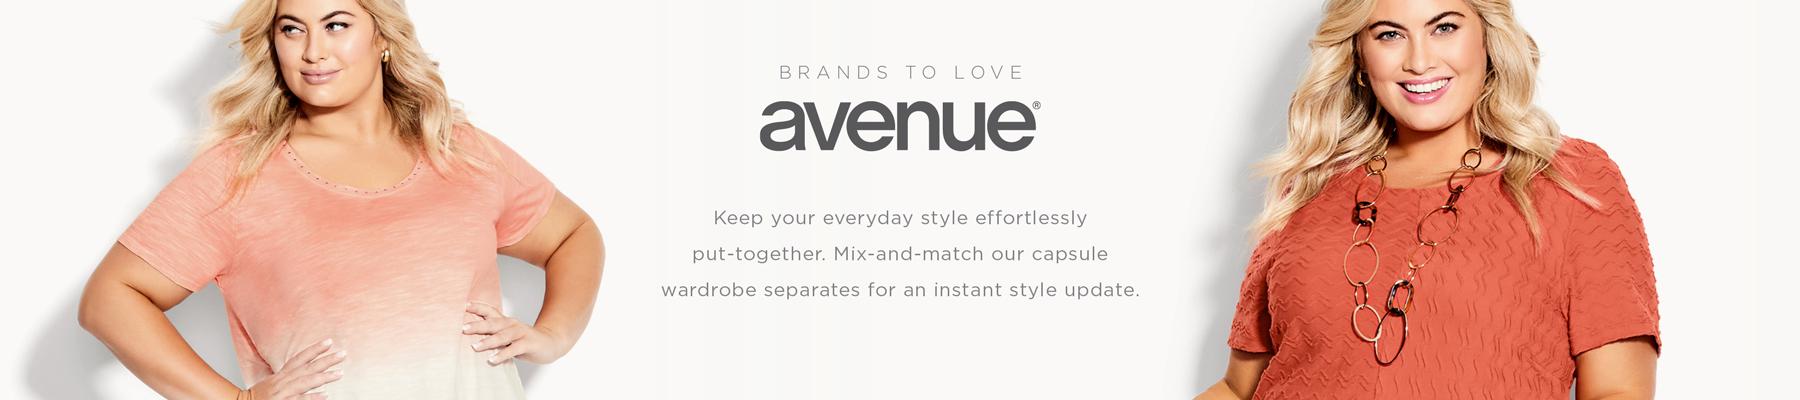 Avenue - Brands to Love